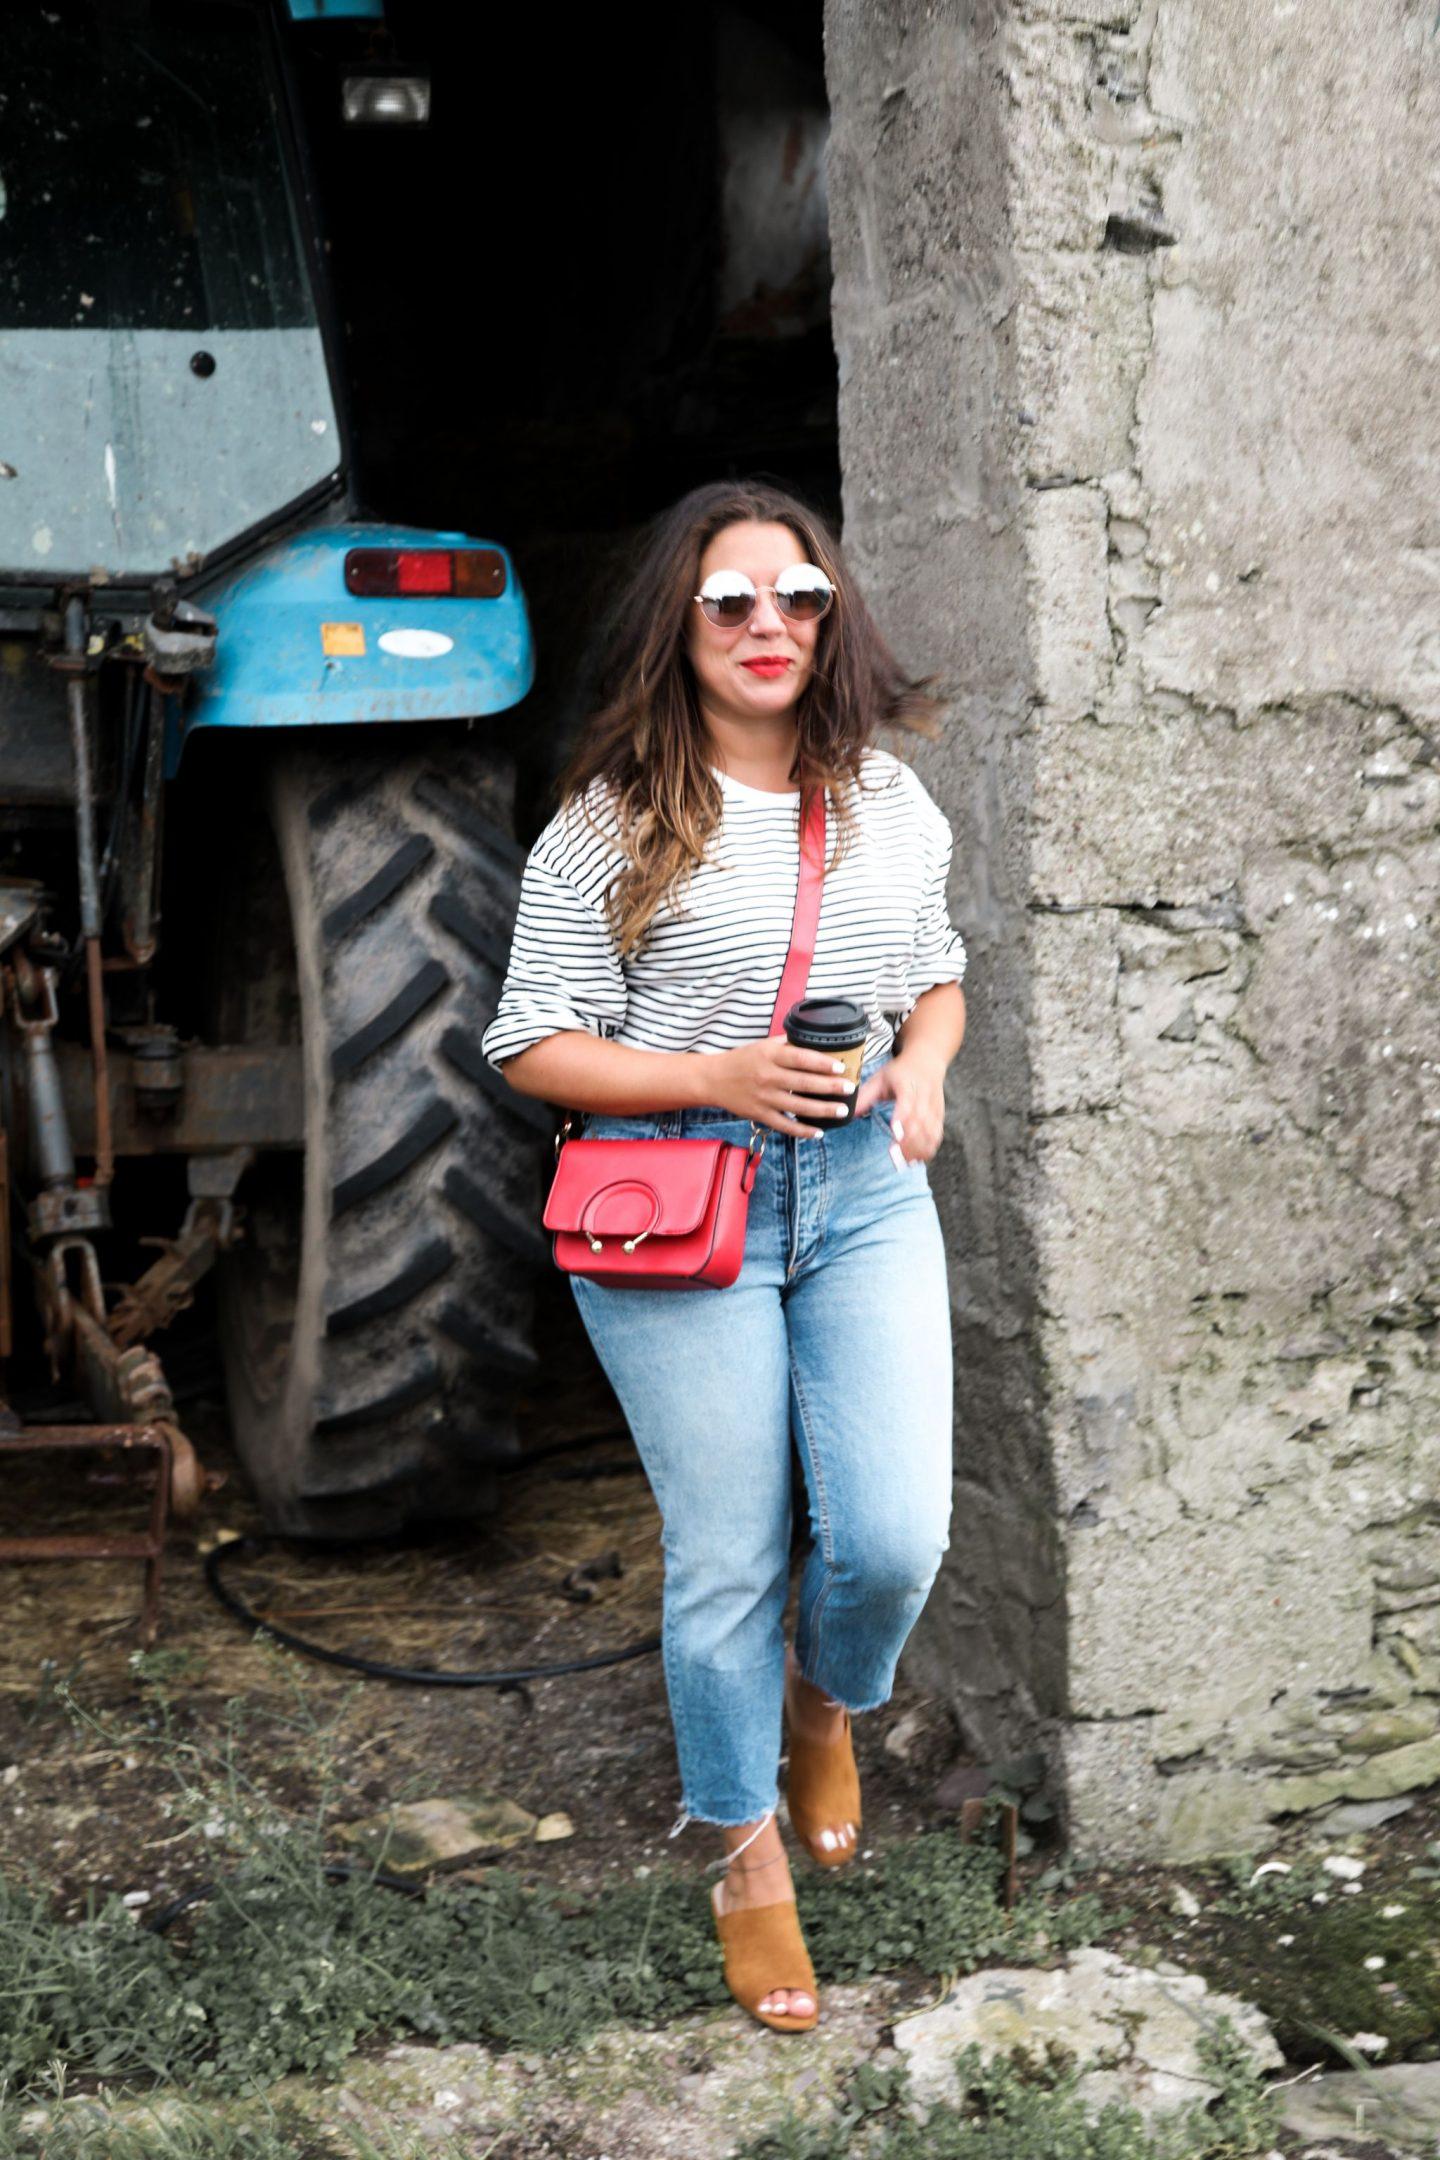 Primark ad - A weekend in Dingle, Co. Kerry, Ireland. Wild Atlantic Way. Penneys, Dingle Mingle